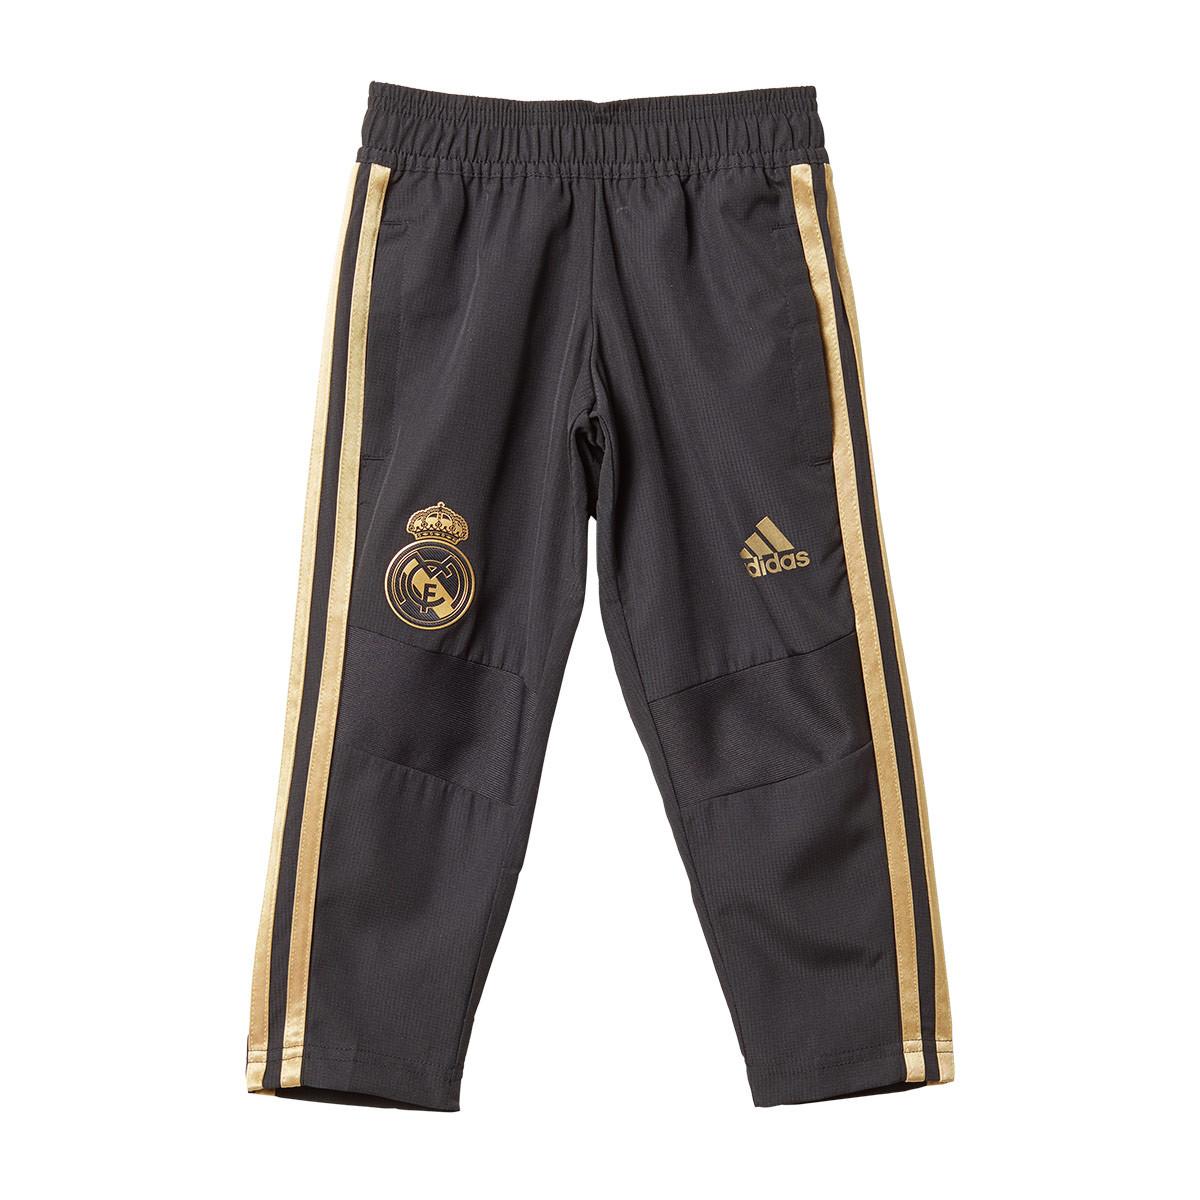 Tuta adidas Real Madrid Pre Match 2019 2020